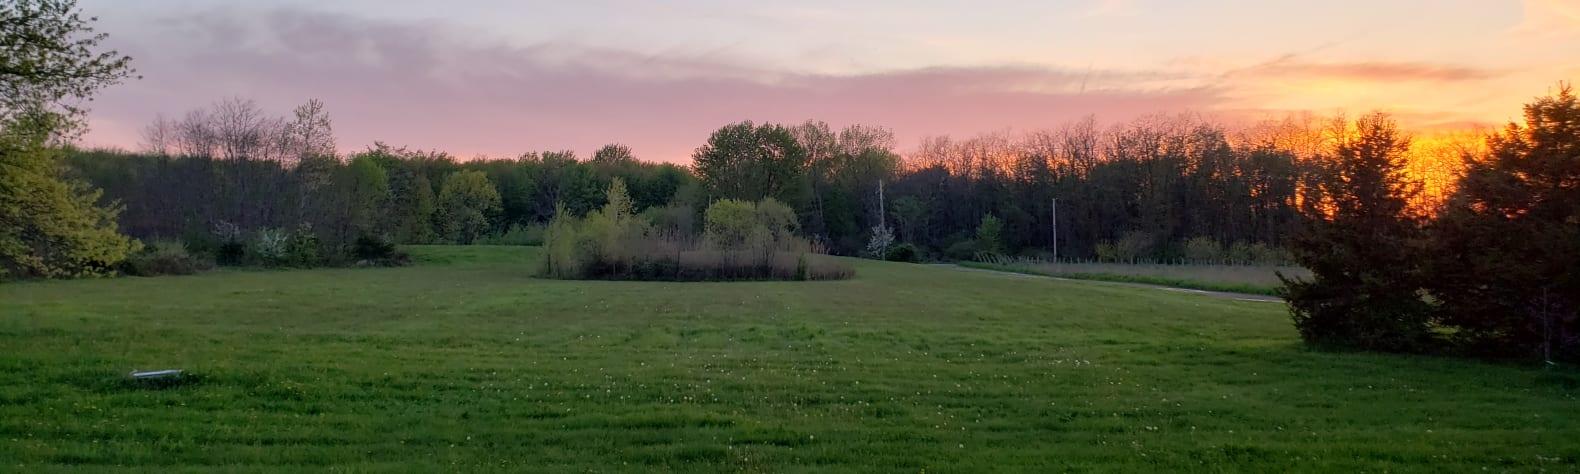 Spring Hill land